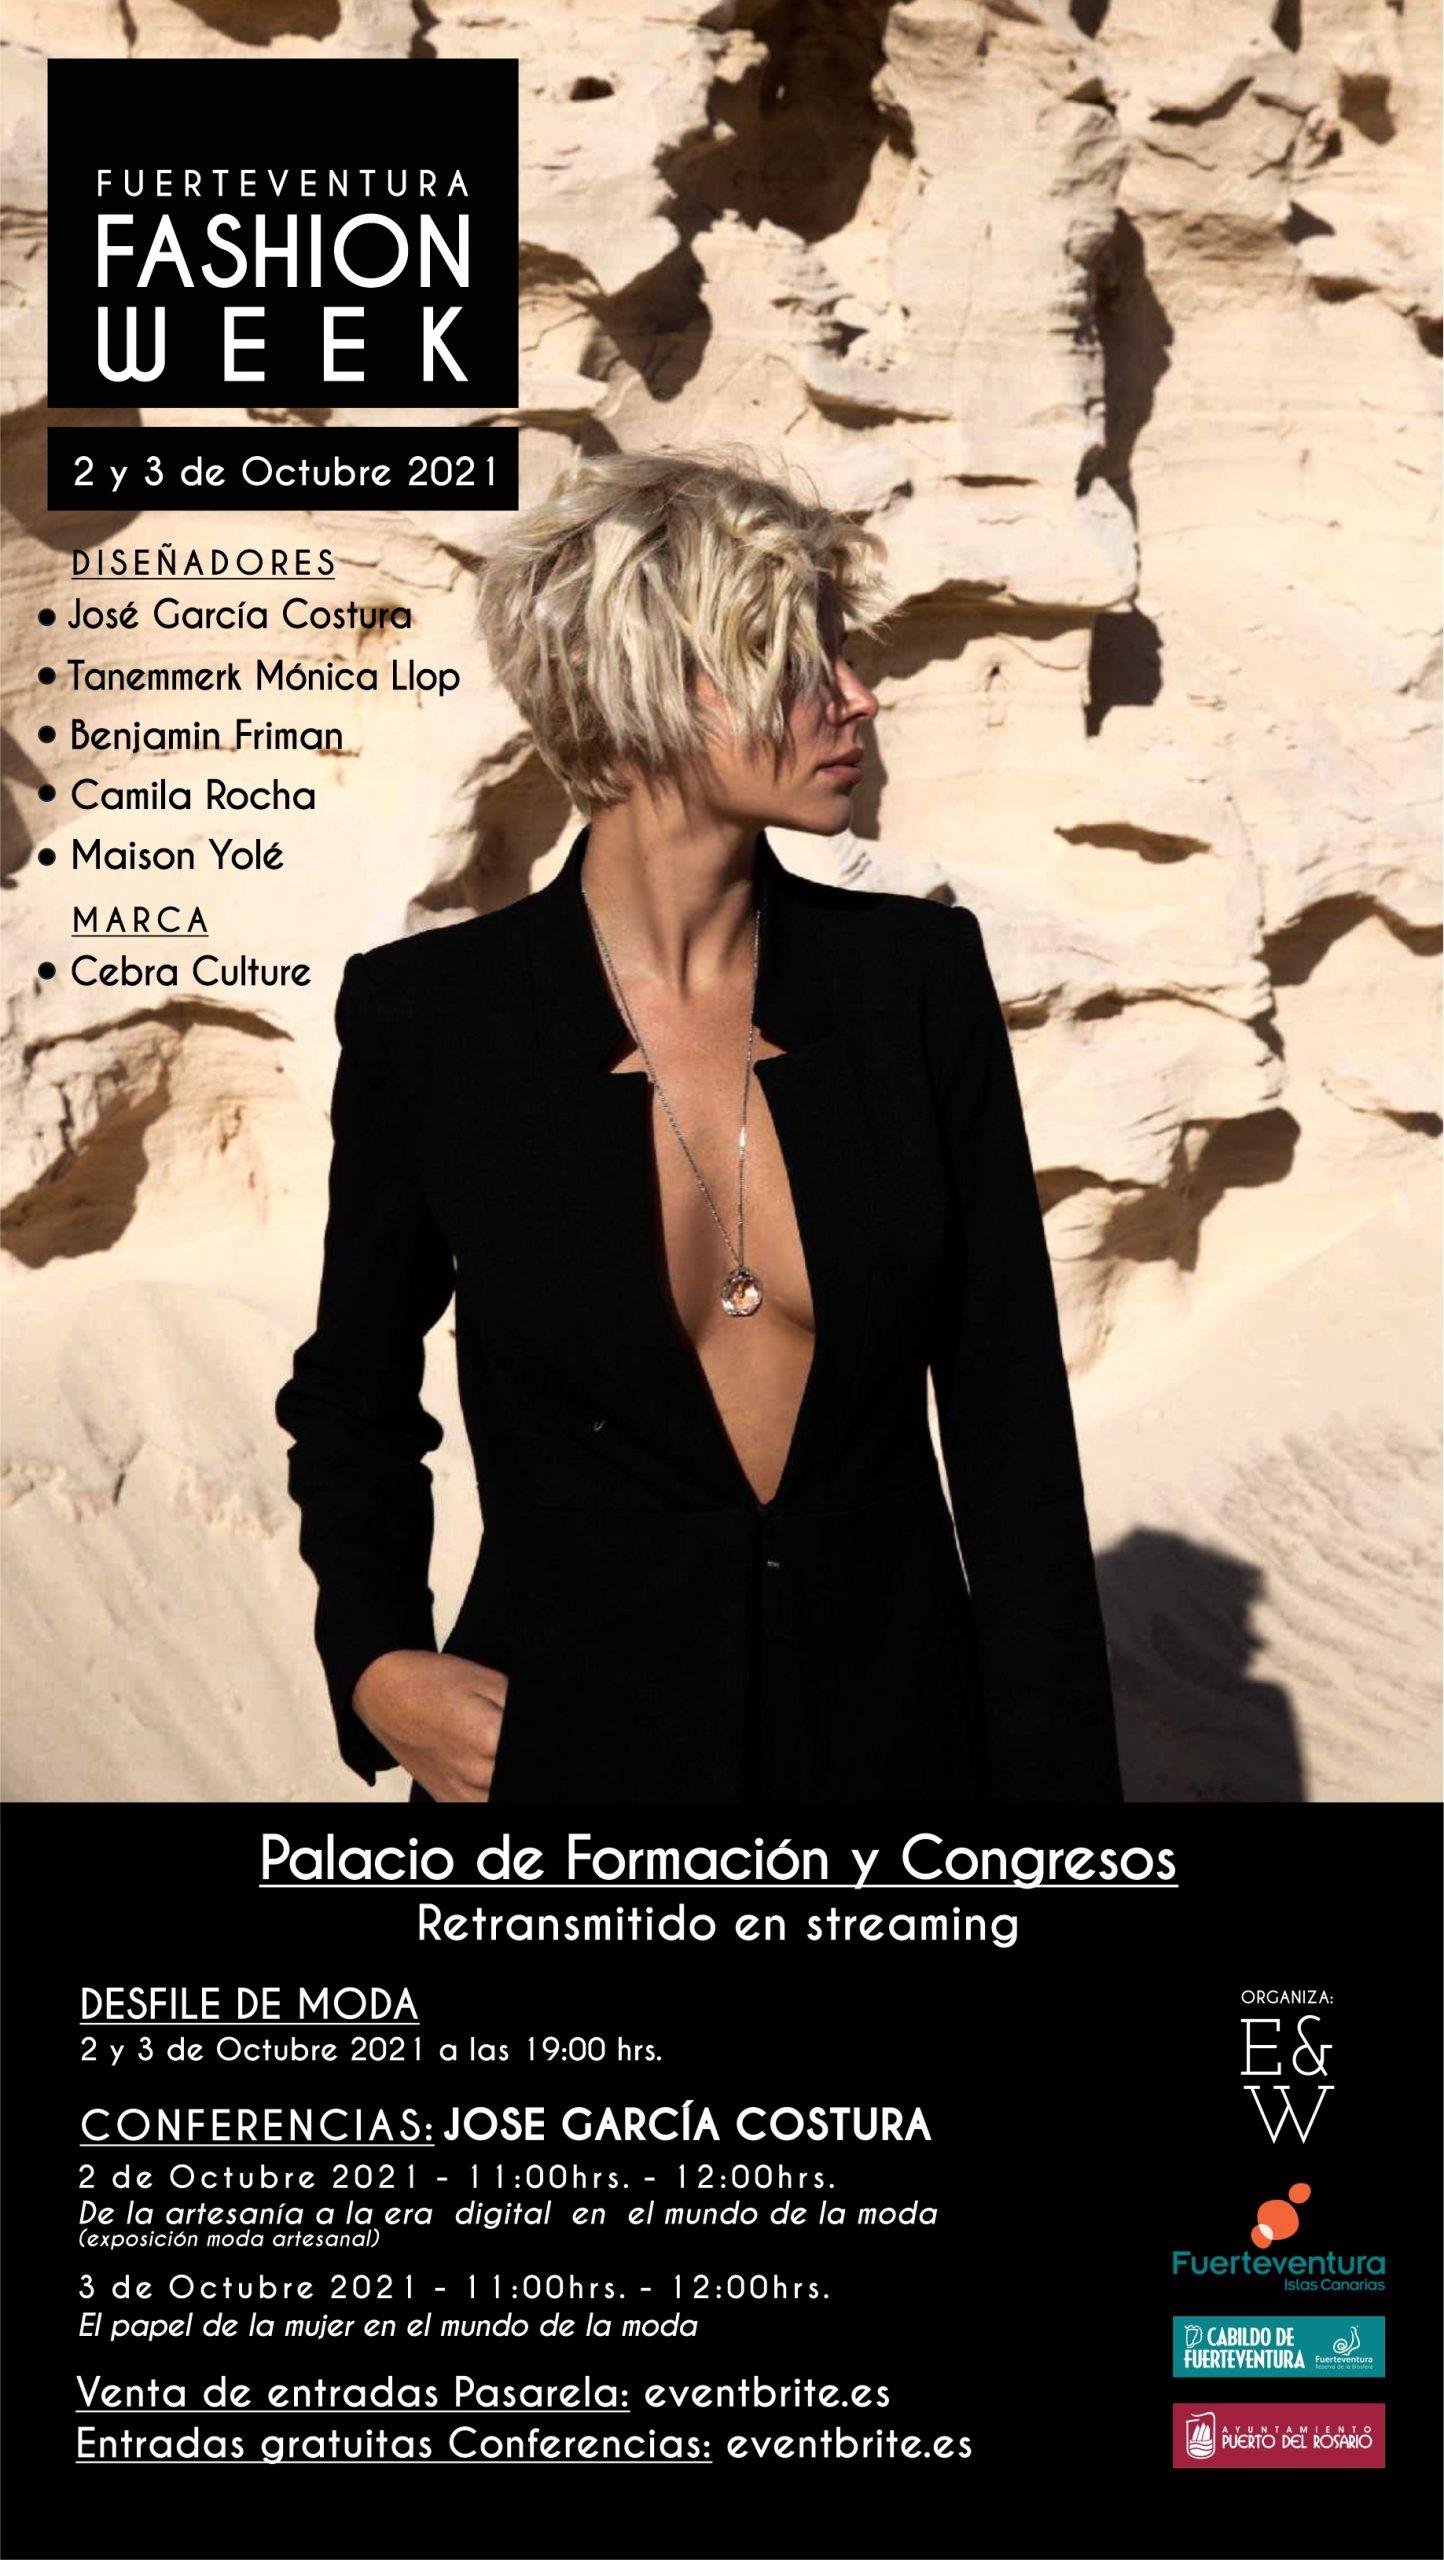 Arranca la Fuerteventura Fashion Week